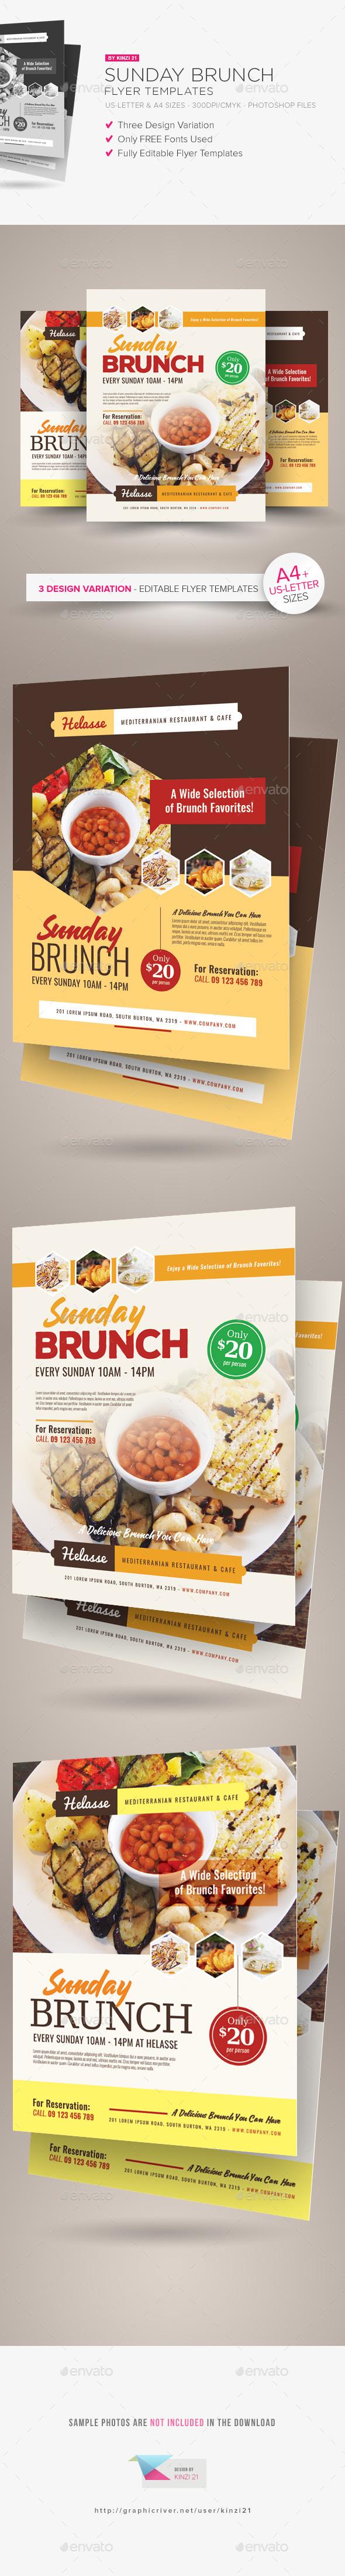 Sunday Brunch Flyer Templates - Restaurant Flyers